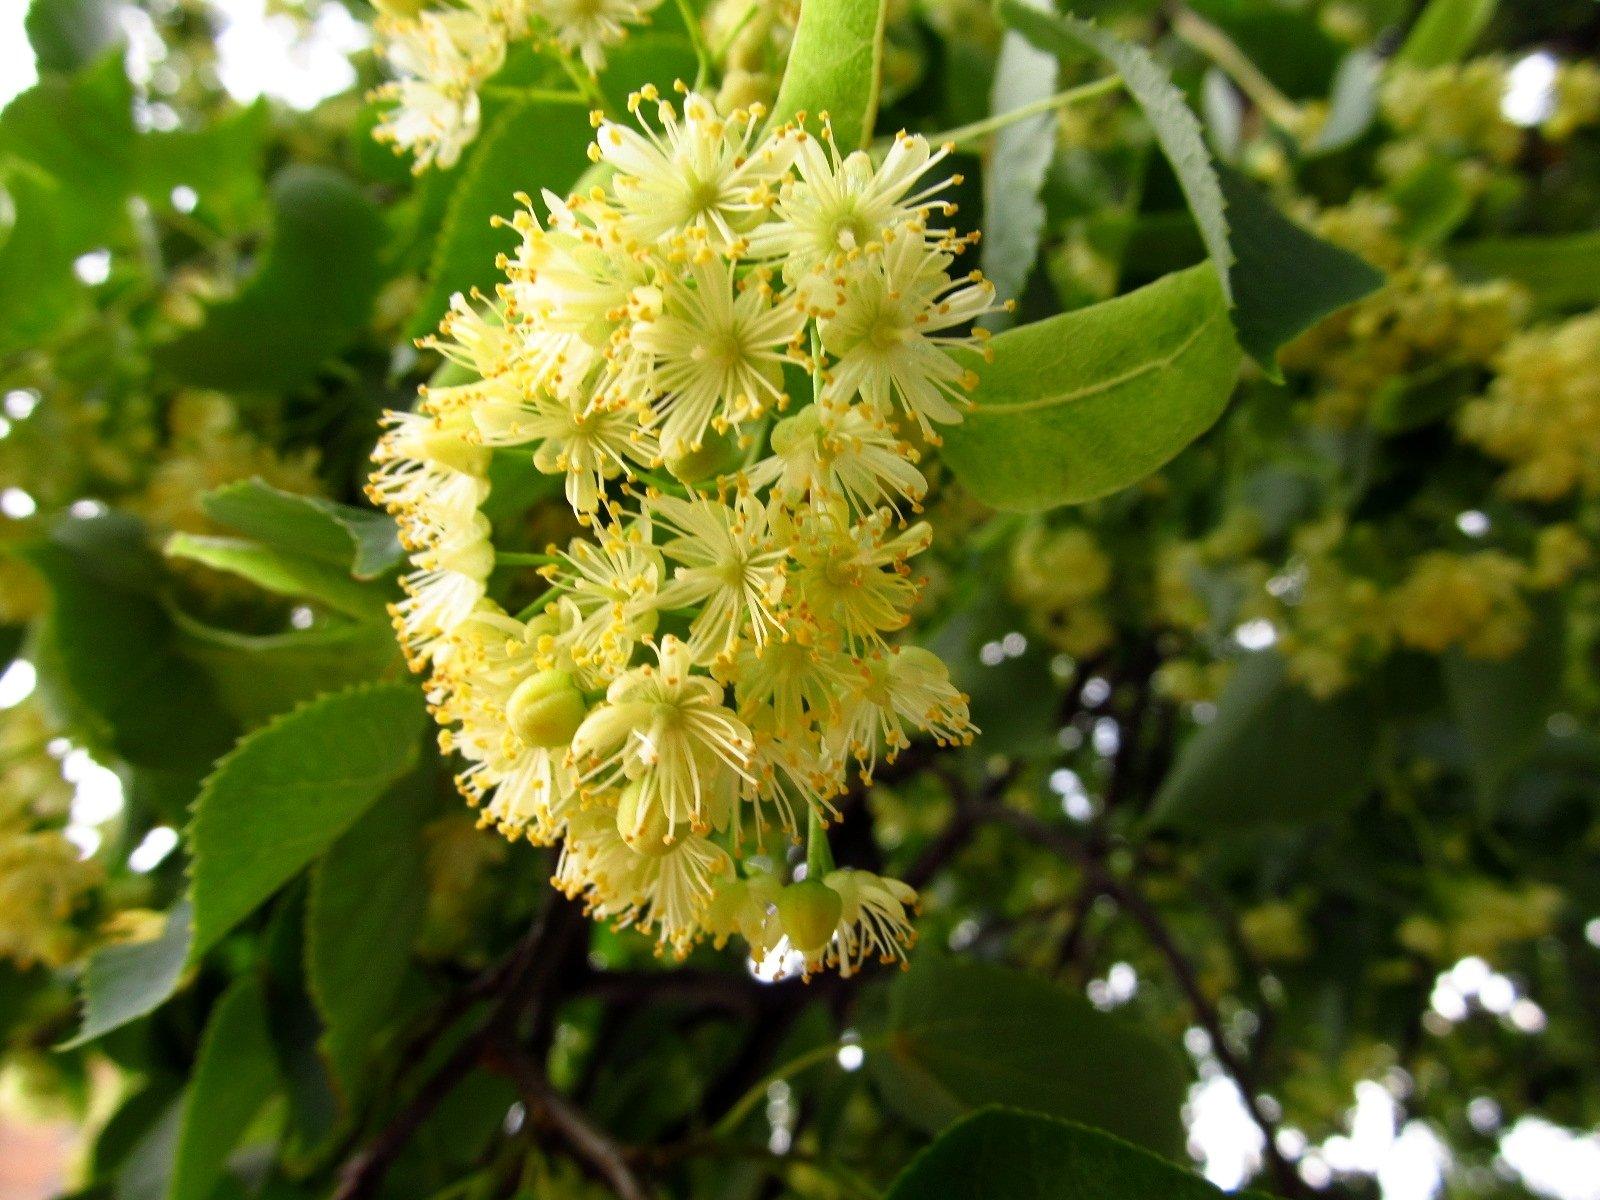 Запах липовых цветов